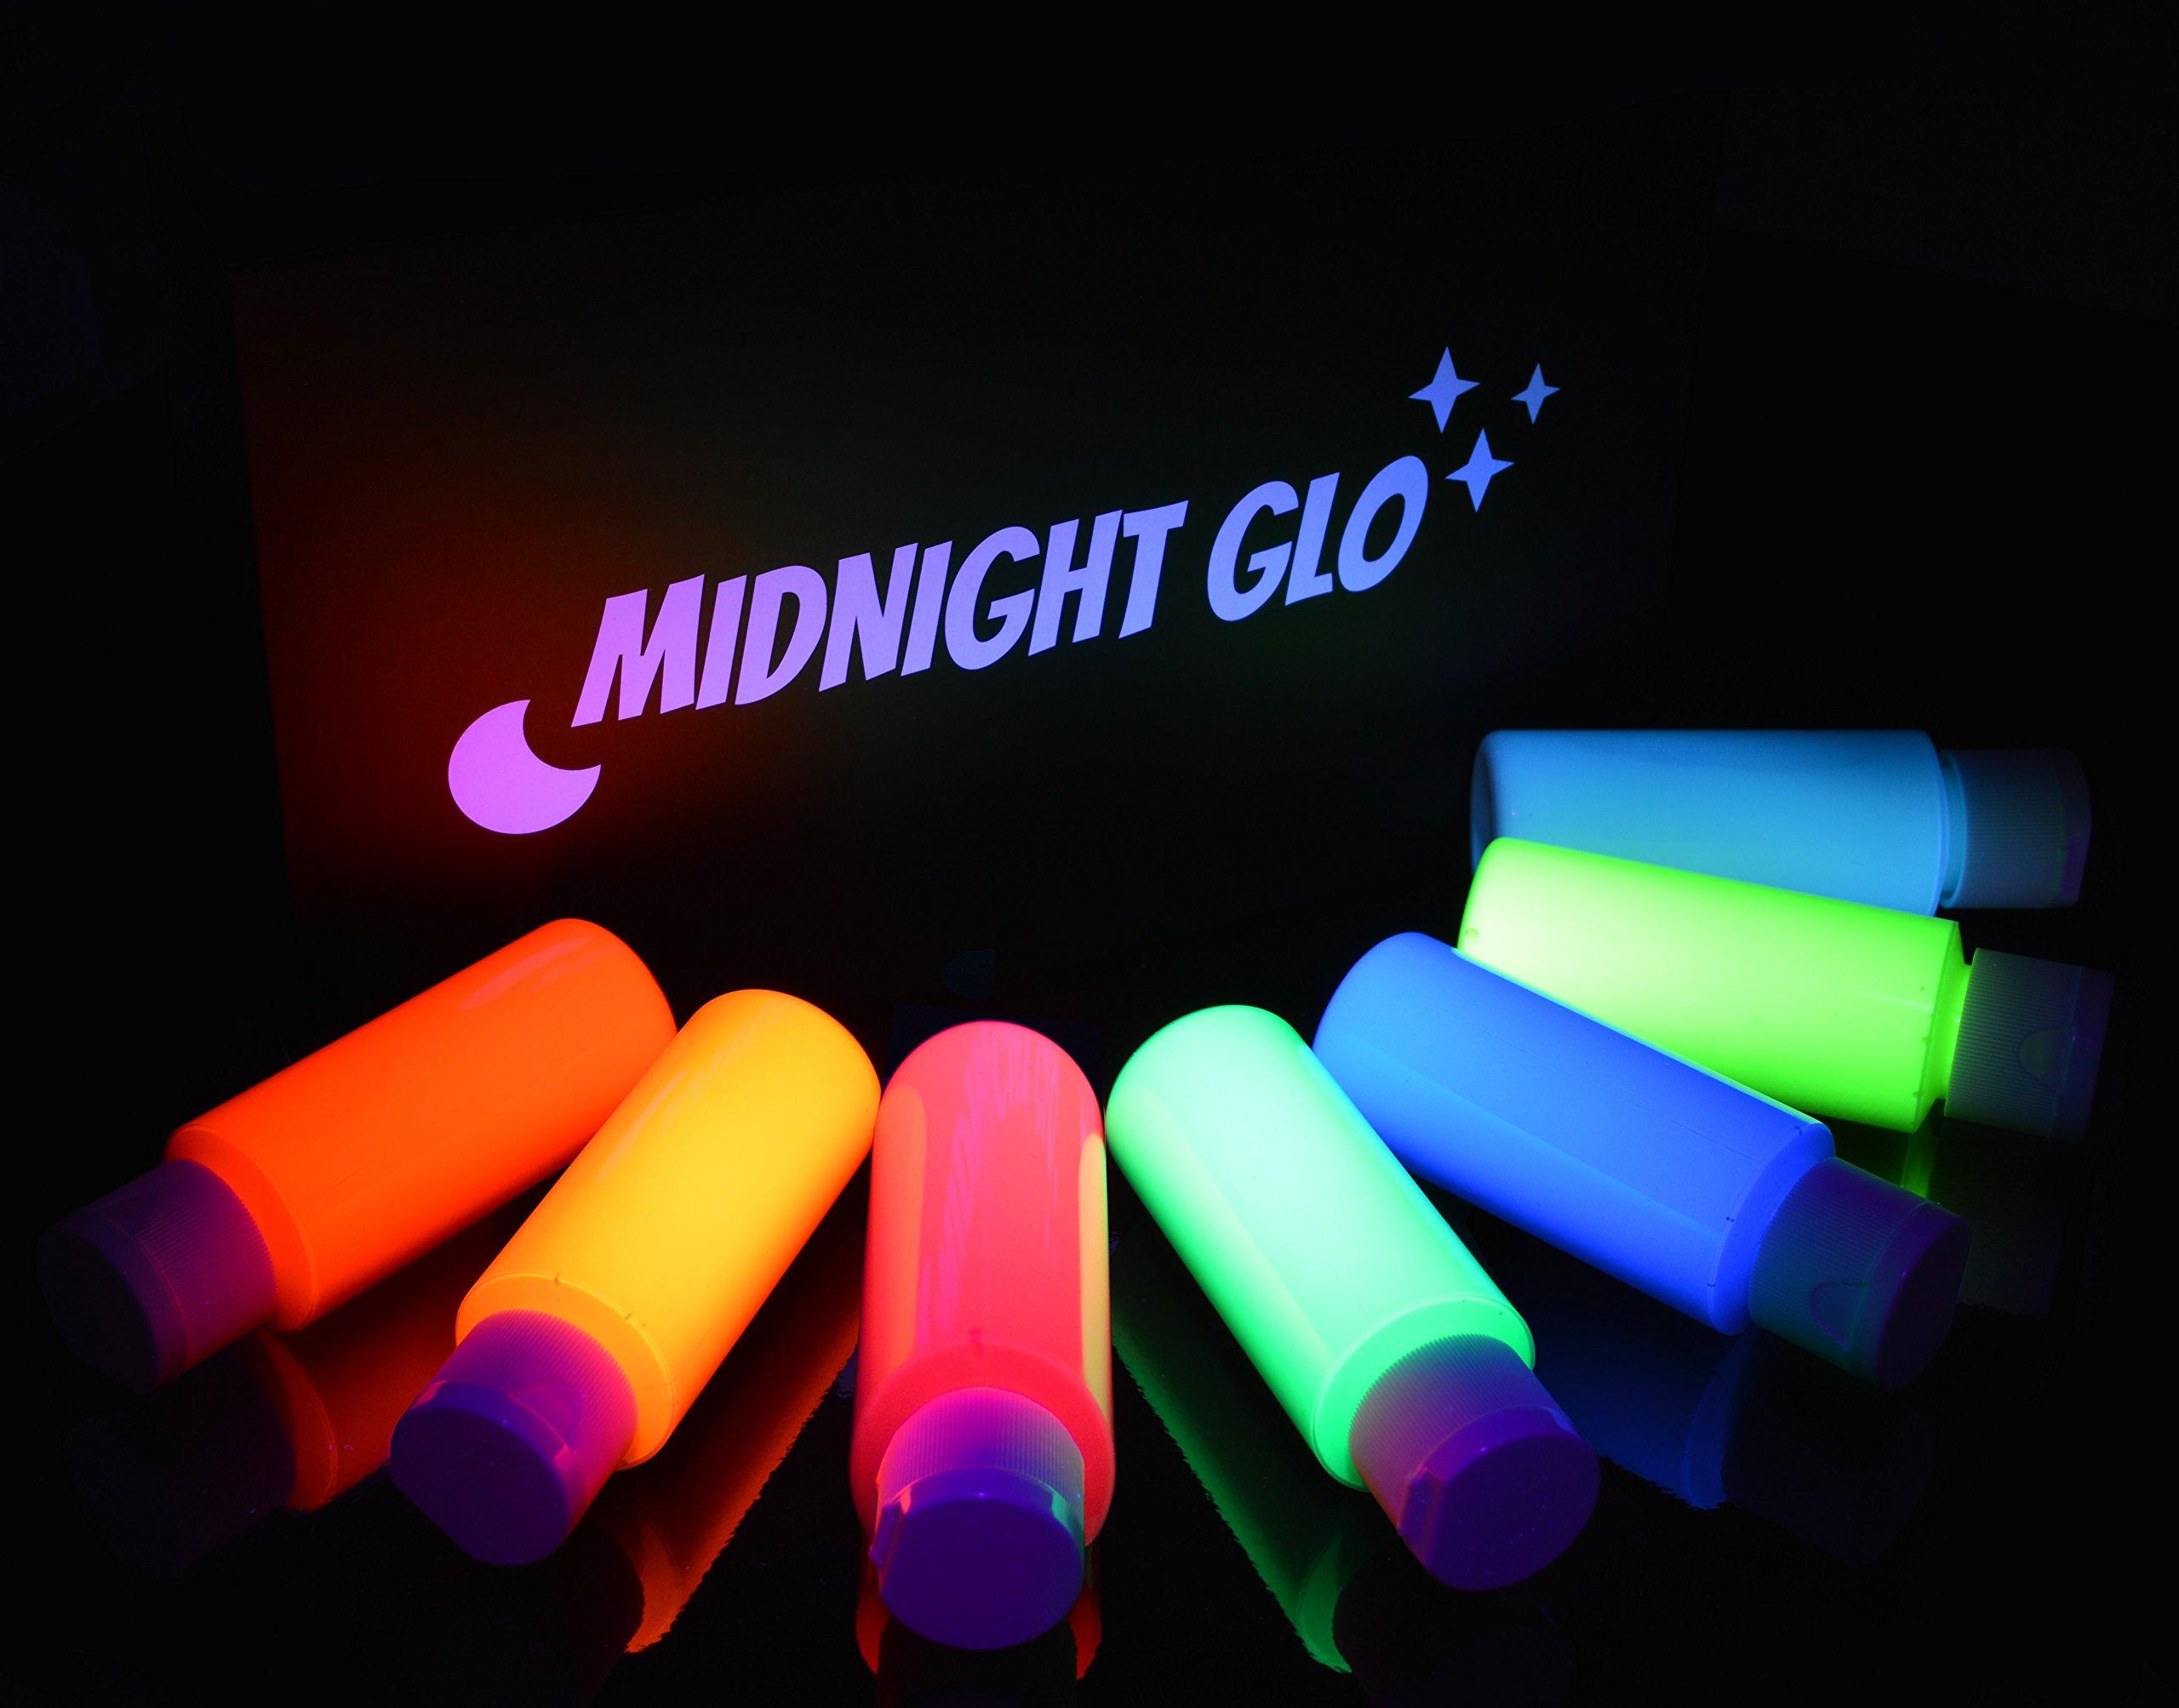 UV Neon Face & Body Paint Glow Kit - Top Rated Blacklight Reactive Fluorescent Paint - Safe, Washable, Non-Toxic, (7 Bottles 2 oz. Each) - 21 LED UV Flashlight - Bonus Paint Brush Set! Midnight Glo by Midnight Glo